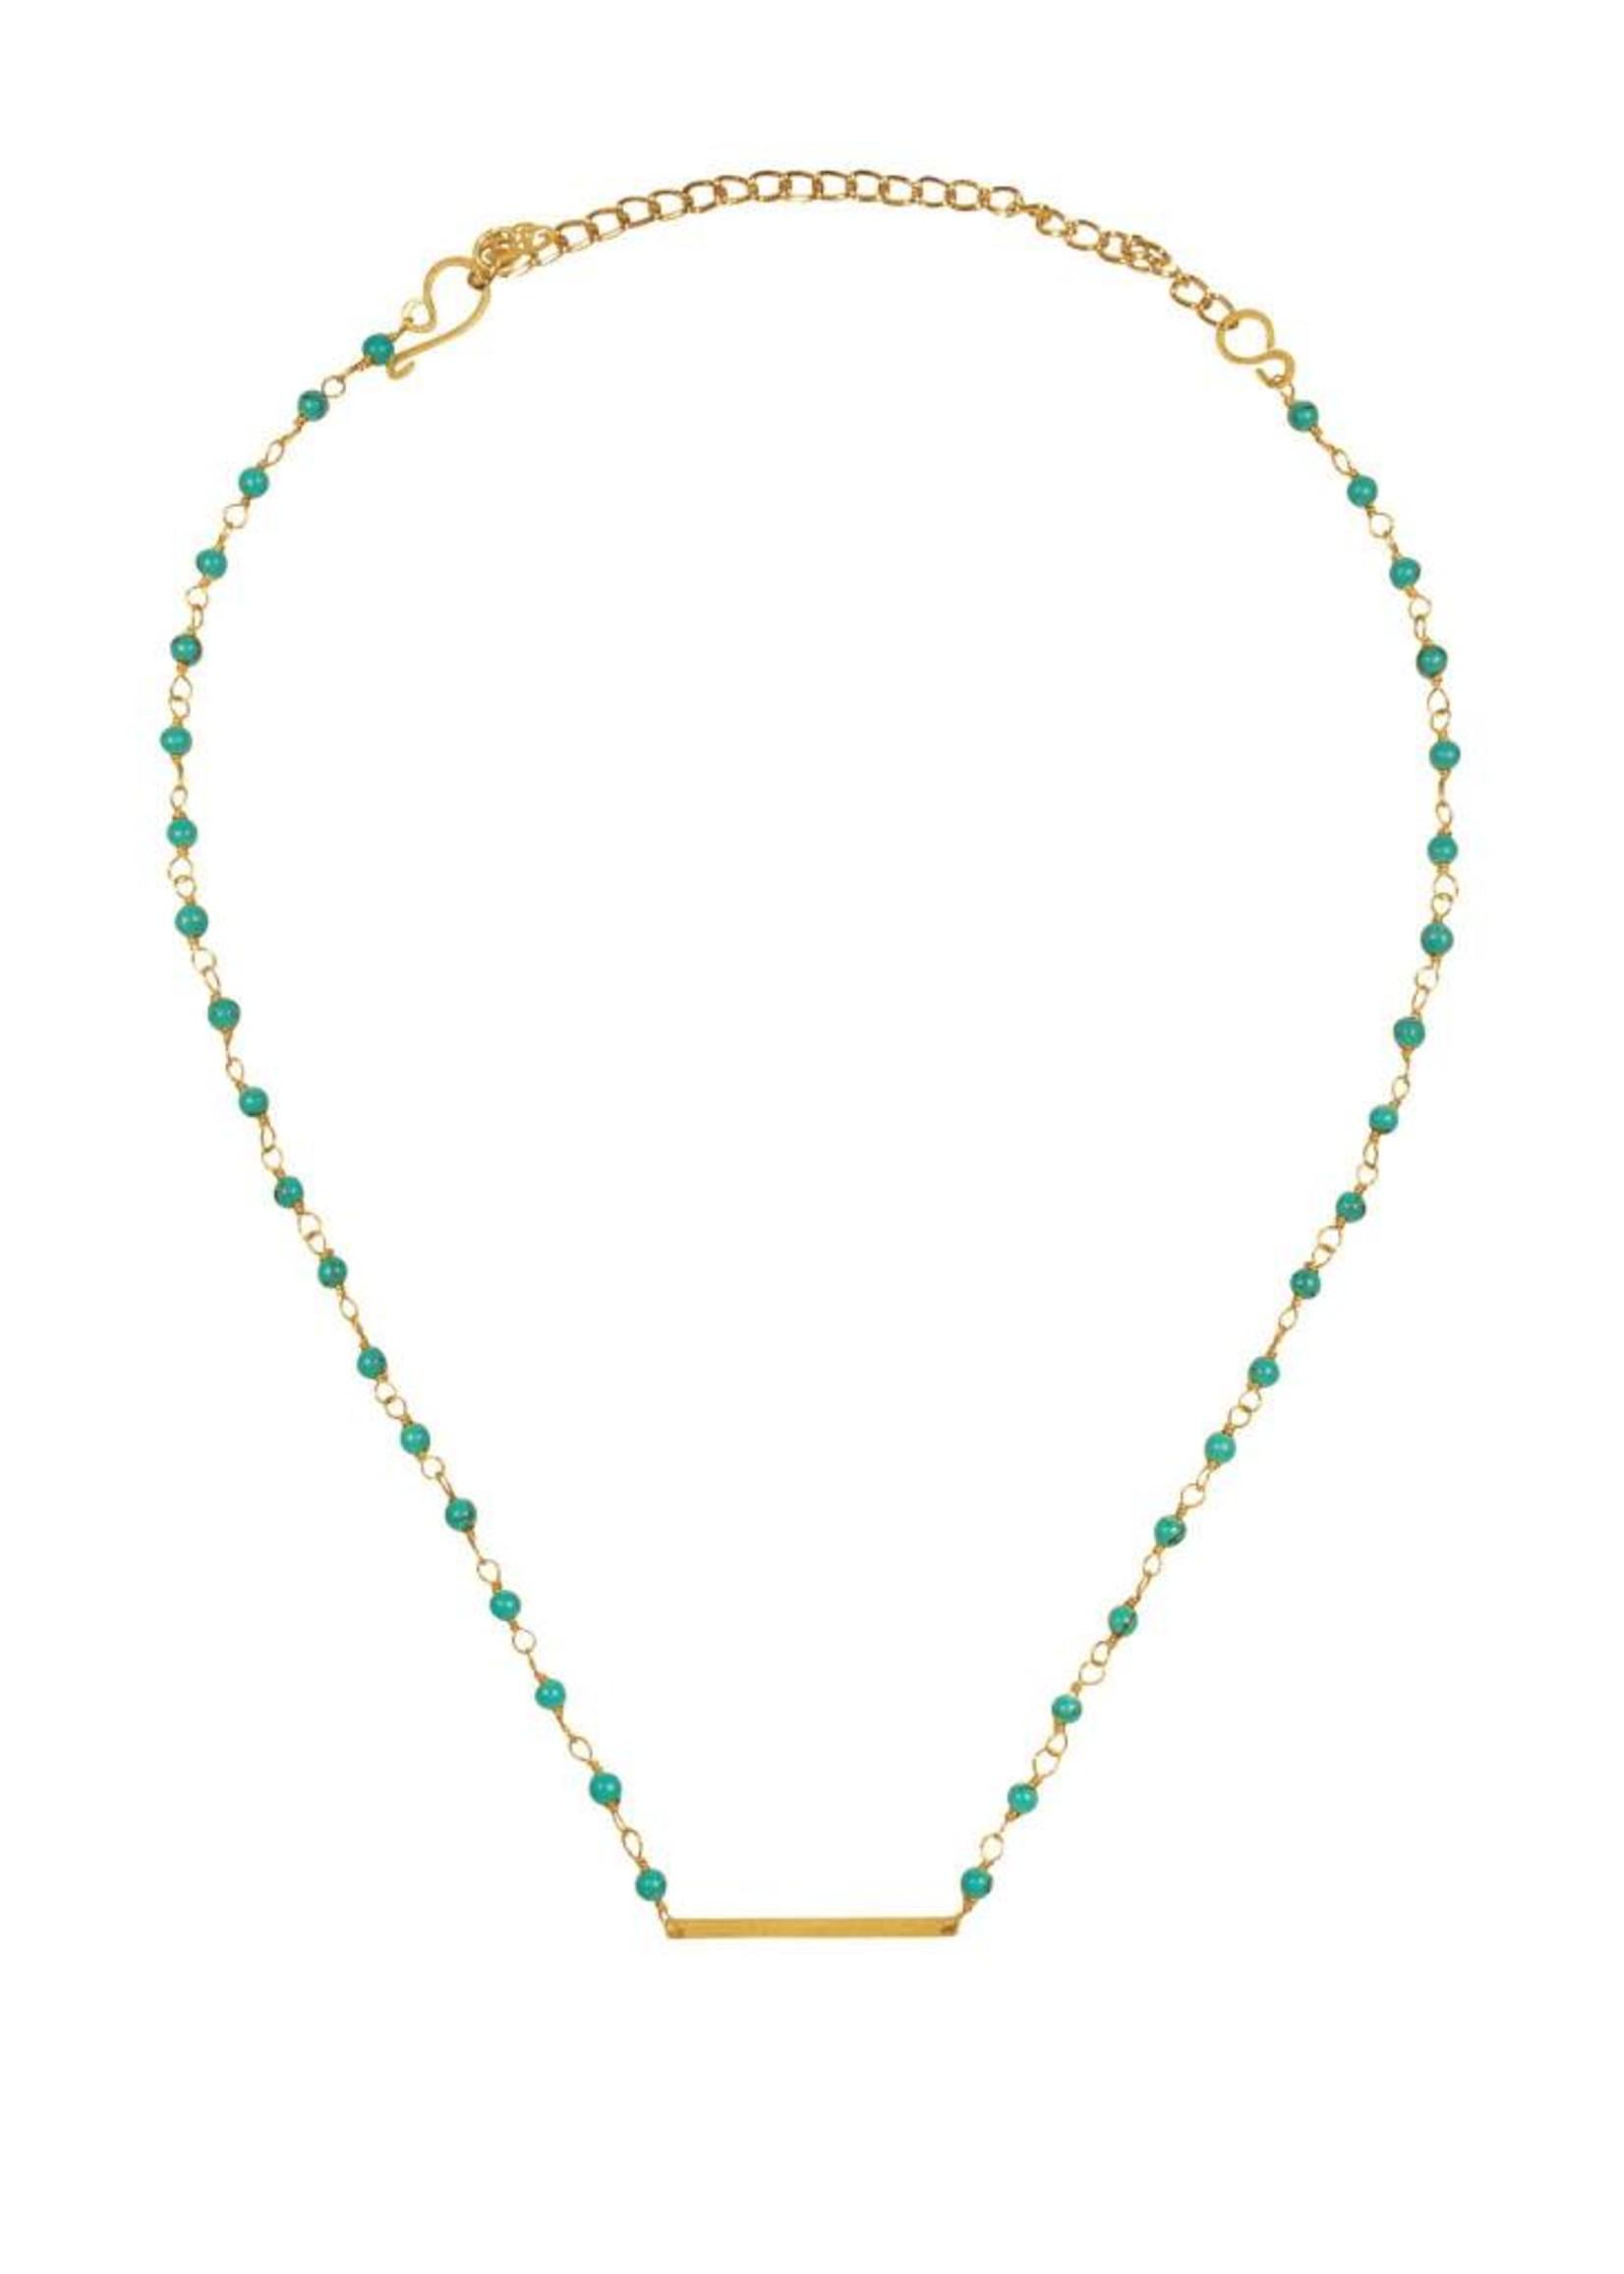 Purpose Jewelry Turquoise Coastal Choker